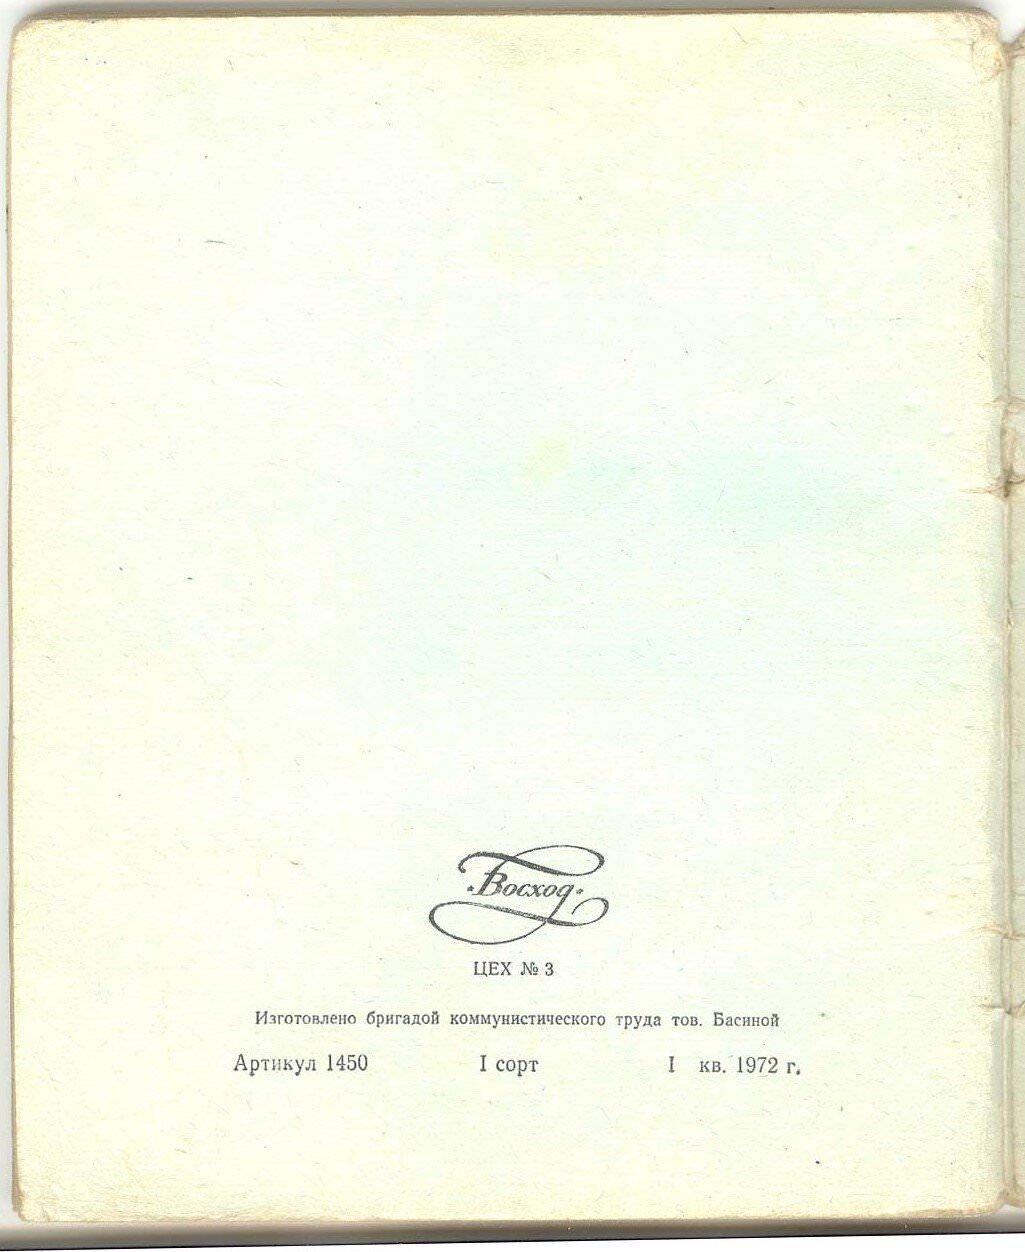 023. 1974-1975. 7 класс. Последний лист